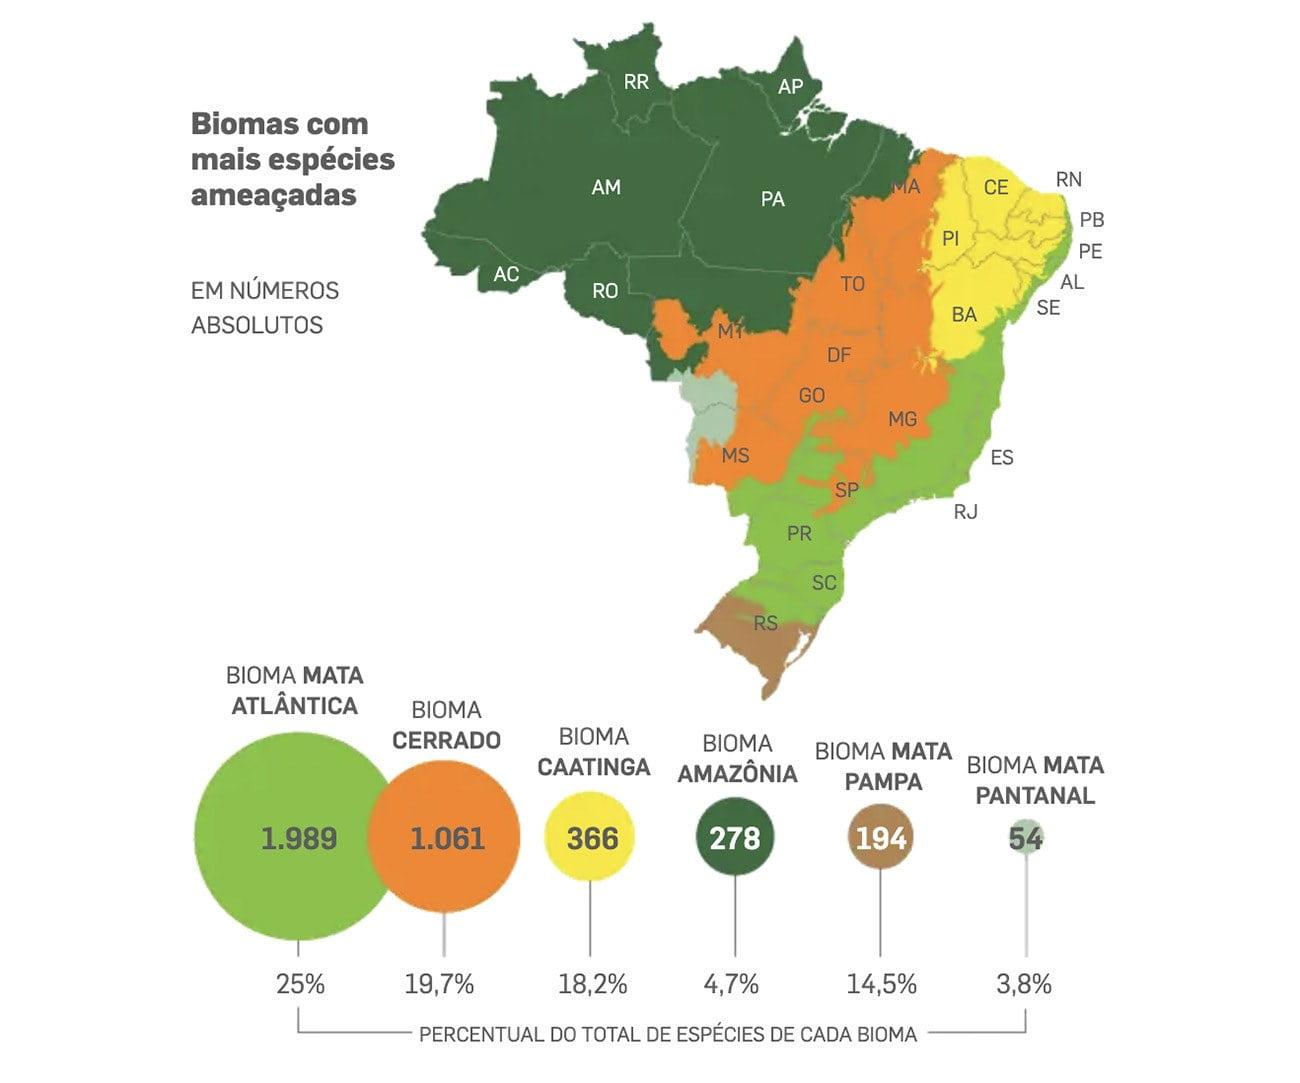 Infográfico mostra espécies amaçadas nos biomas brasileiros